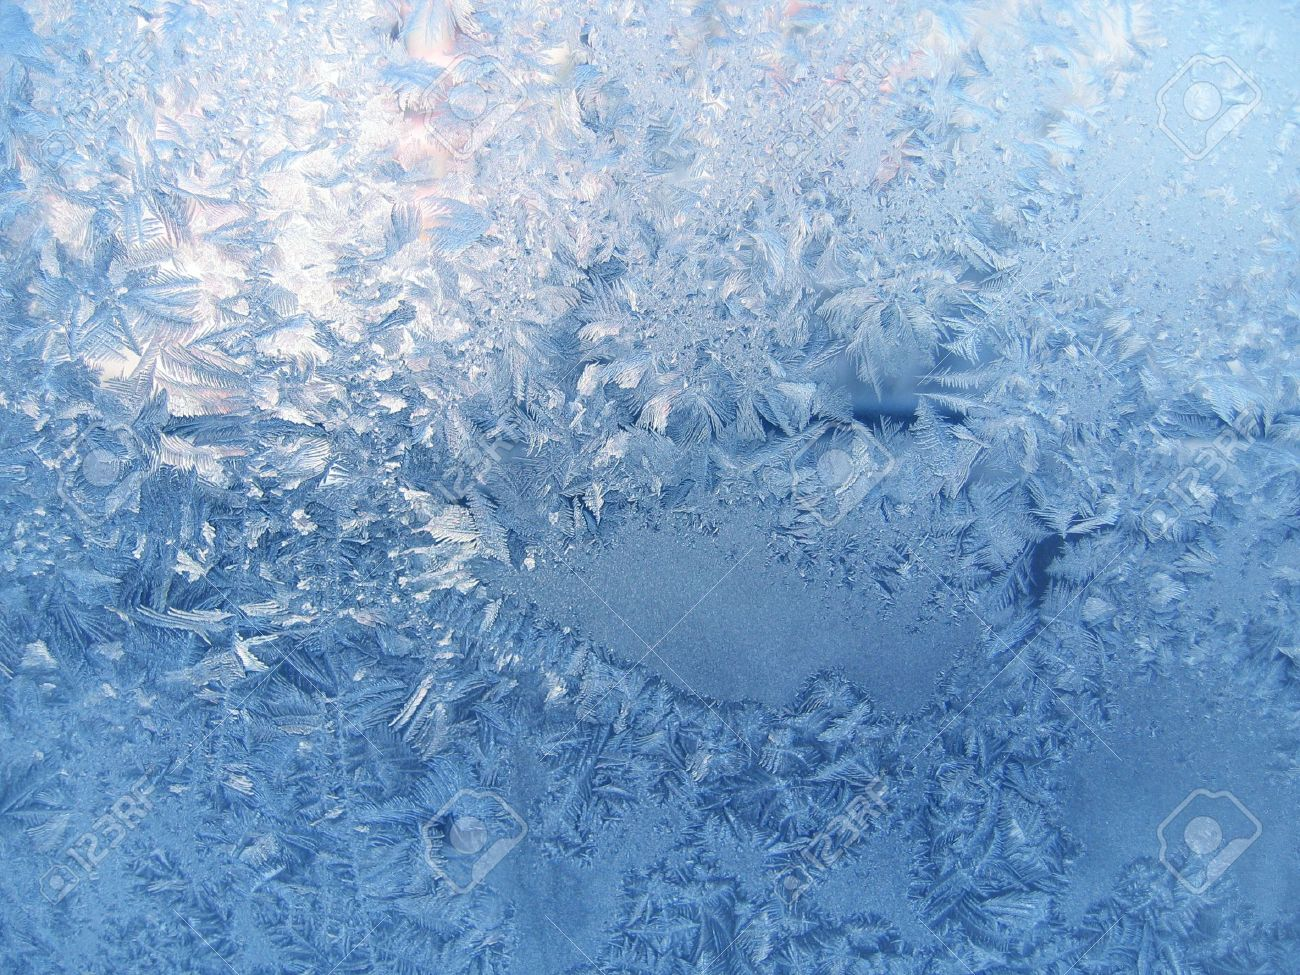 frosty natural pattern on winter window - 5837576